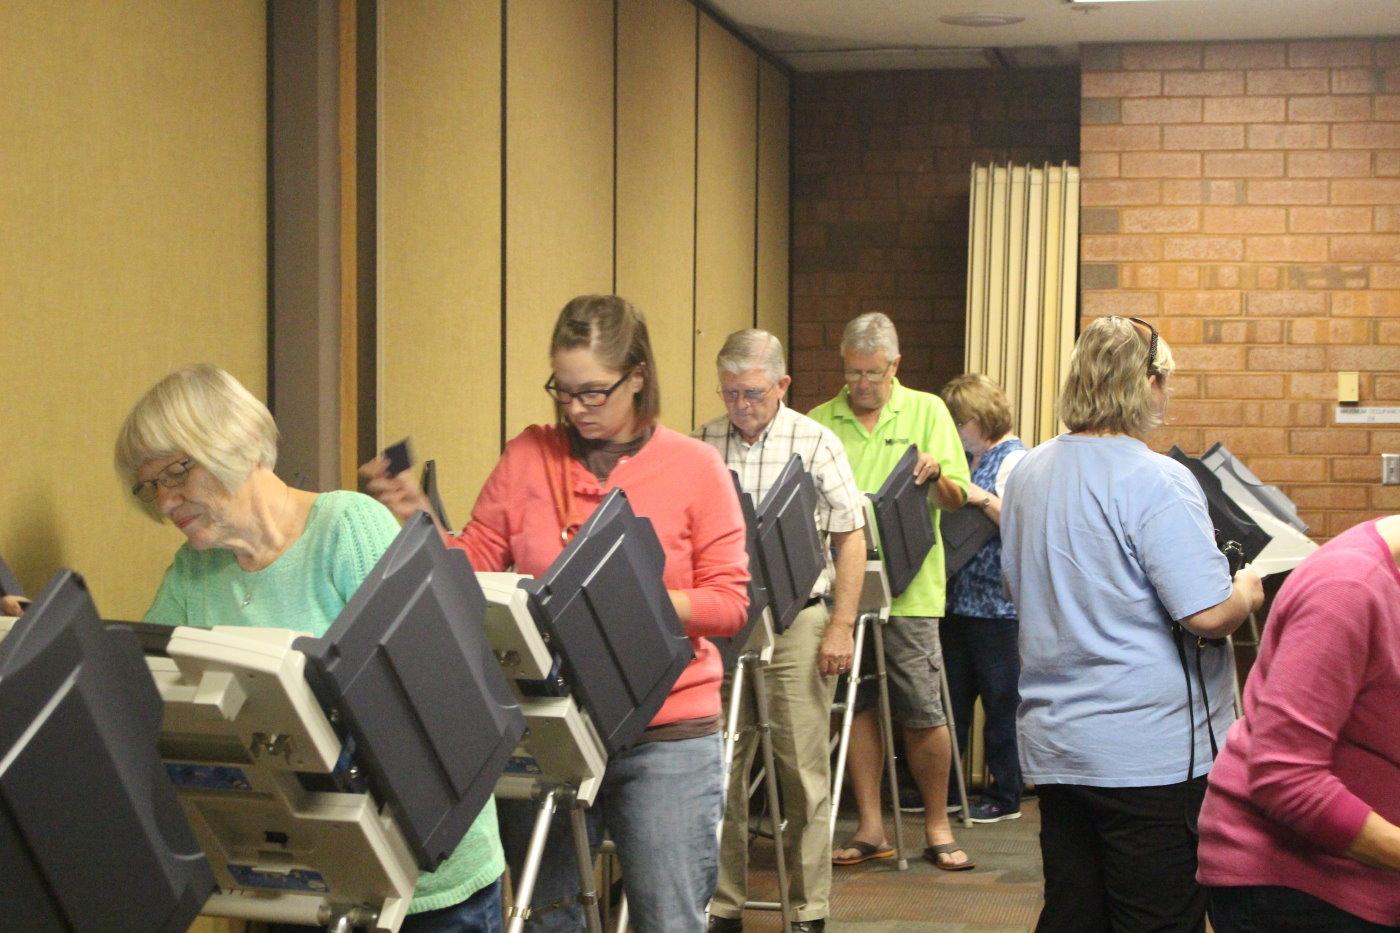 St. George residents voting early in the 2016 general election, St. George, Utah, Nov. 4, 2016 | Photo by Mori Kessler, St. George News